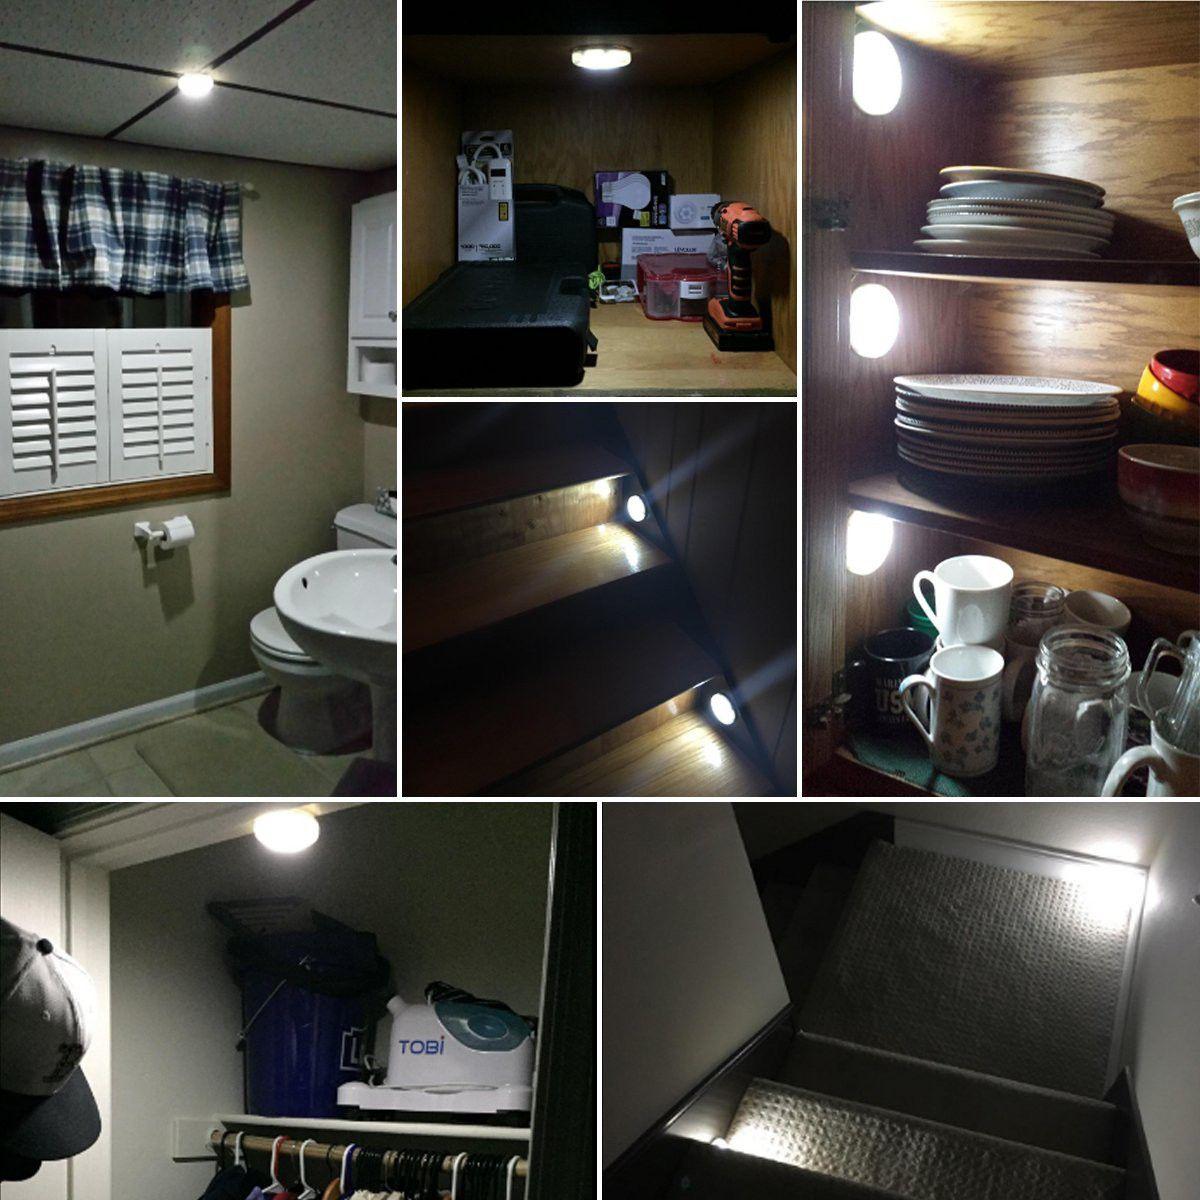 lighting for closet. LED Stick On Closet Lights With Motion Sensor - 3 Pack Lighting For